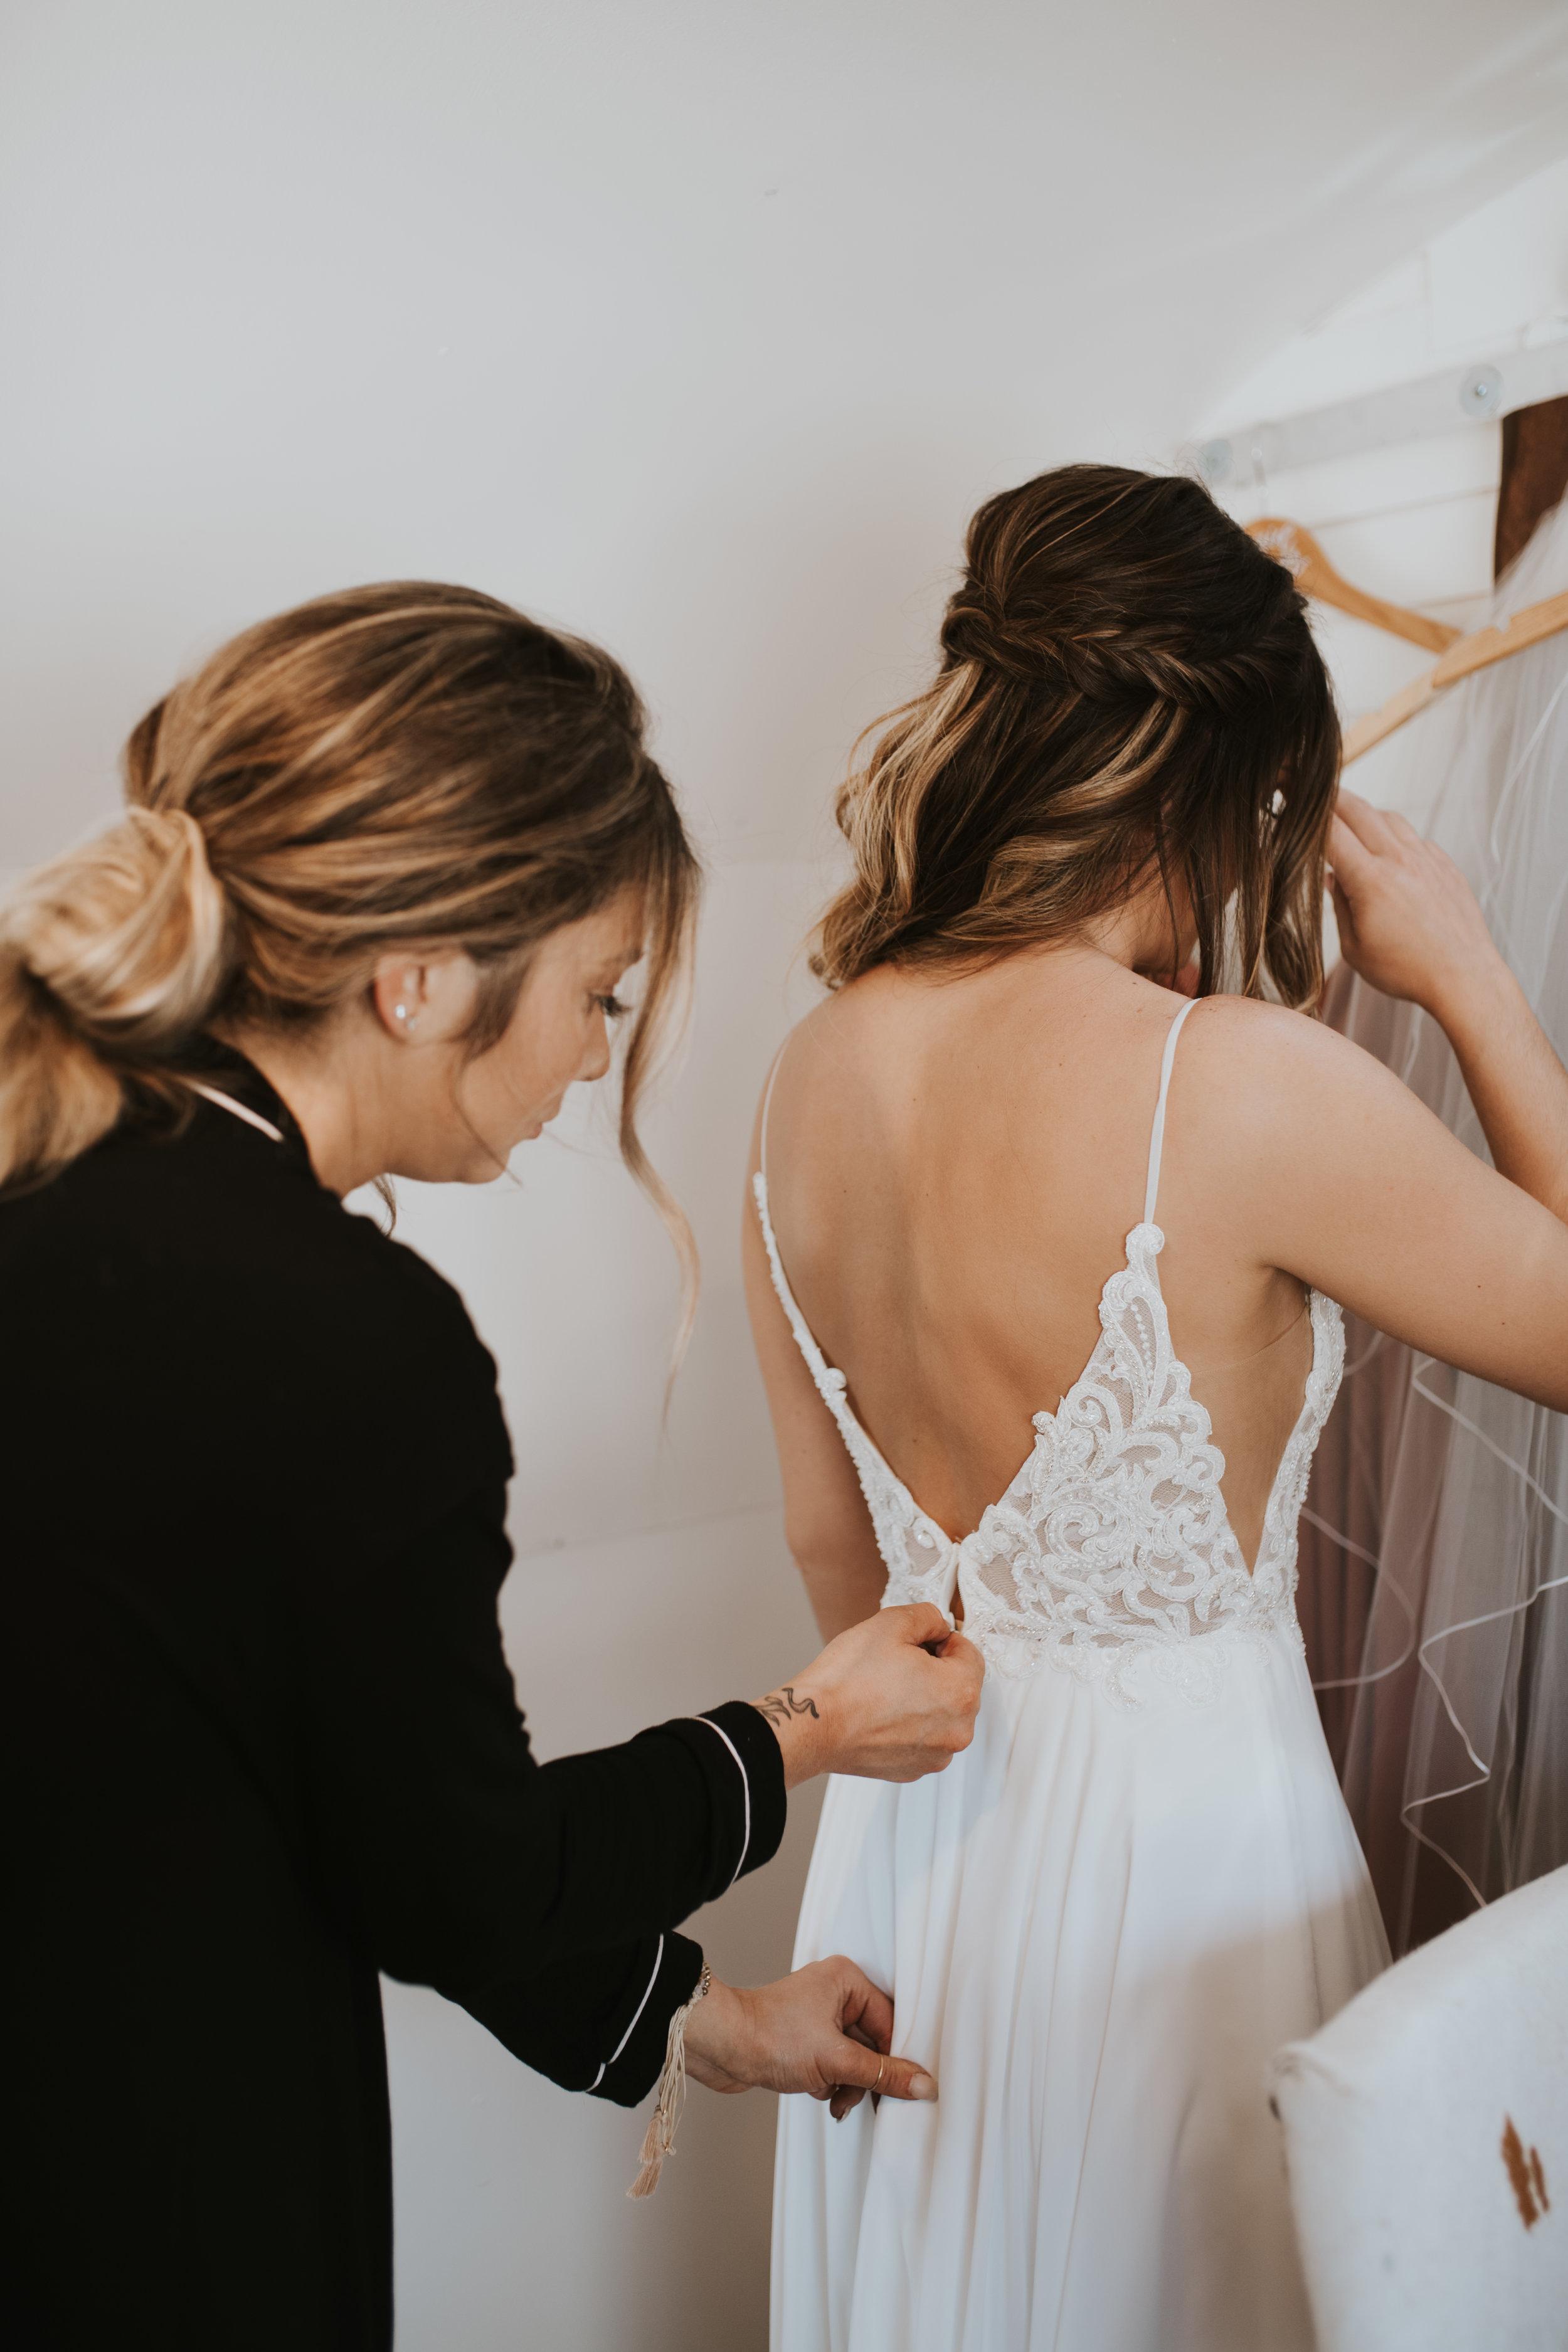 getting zipped spokane bride